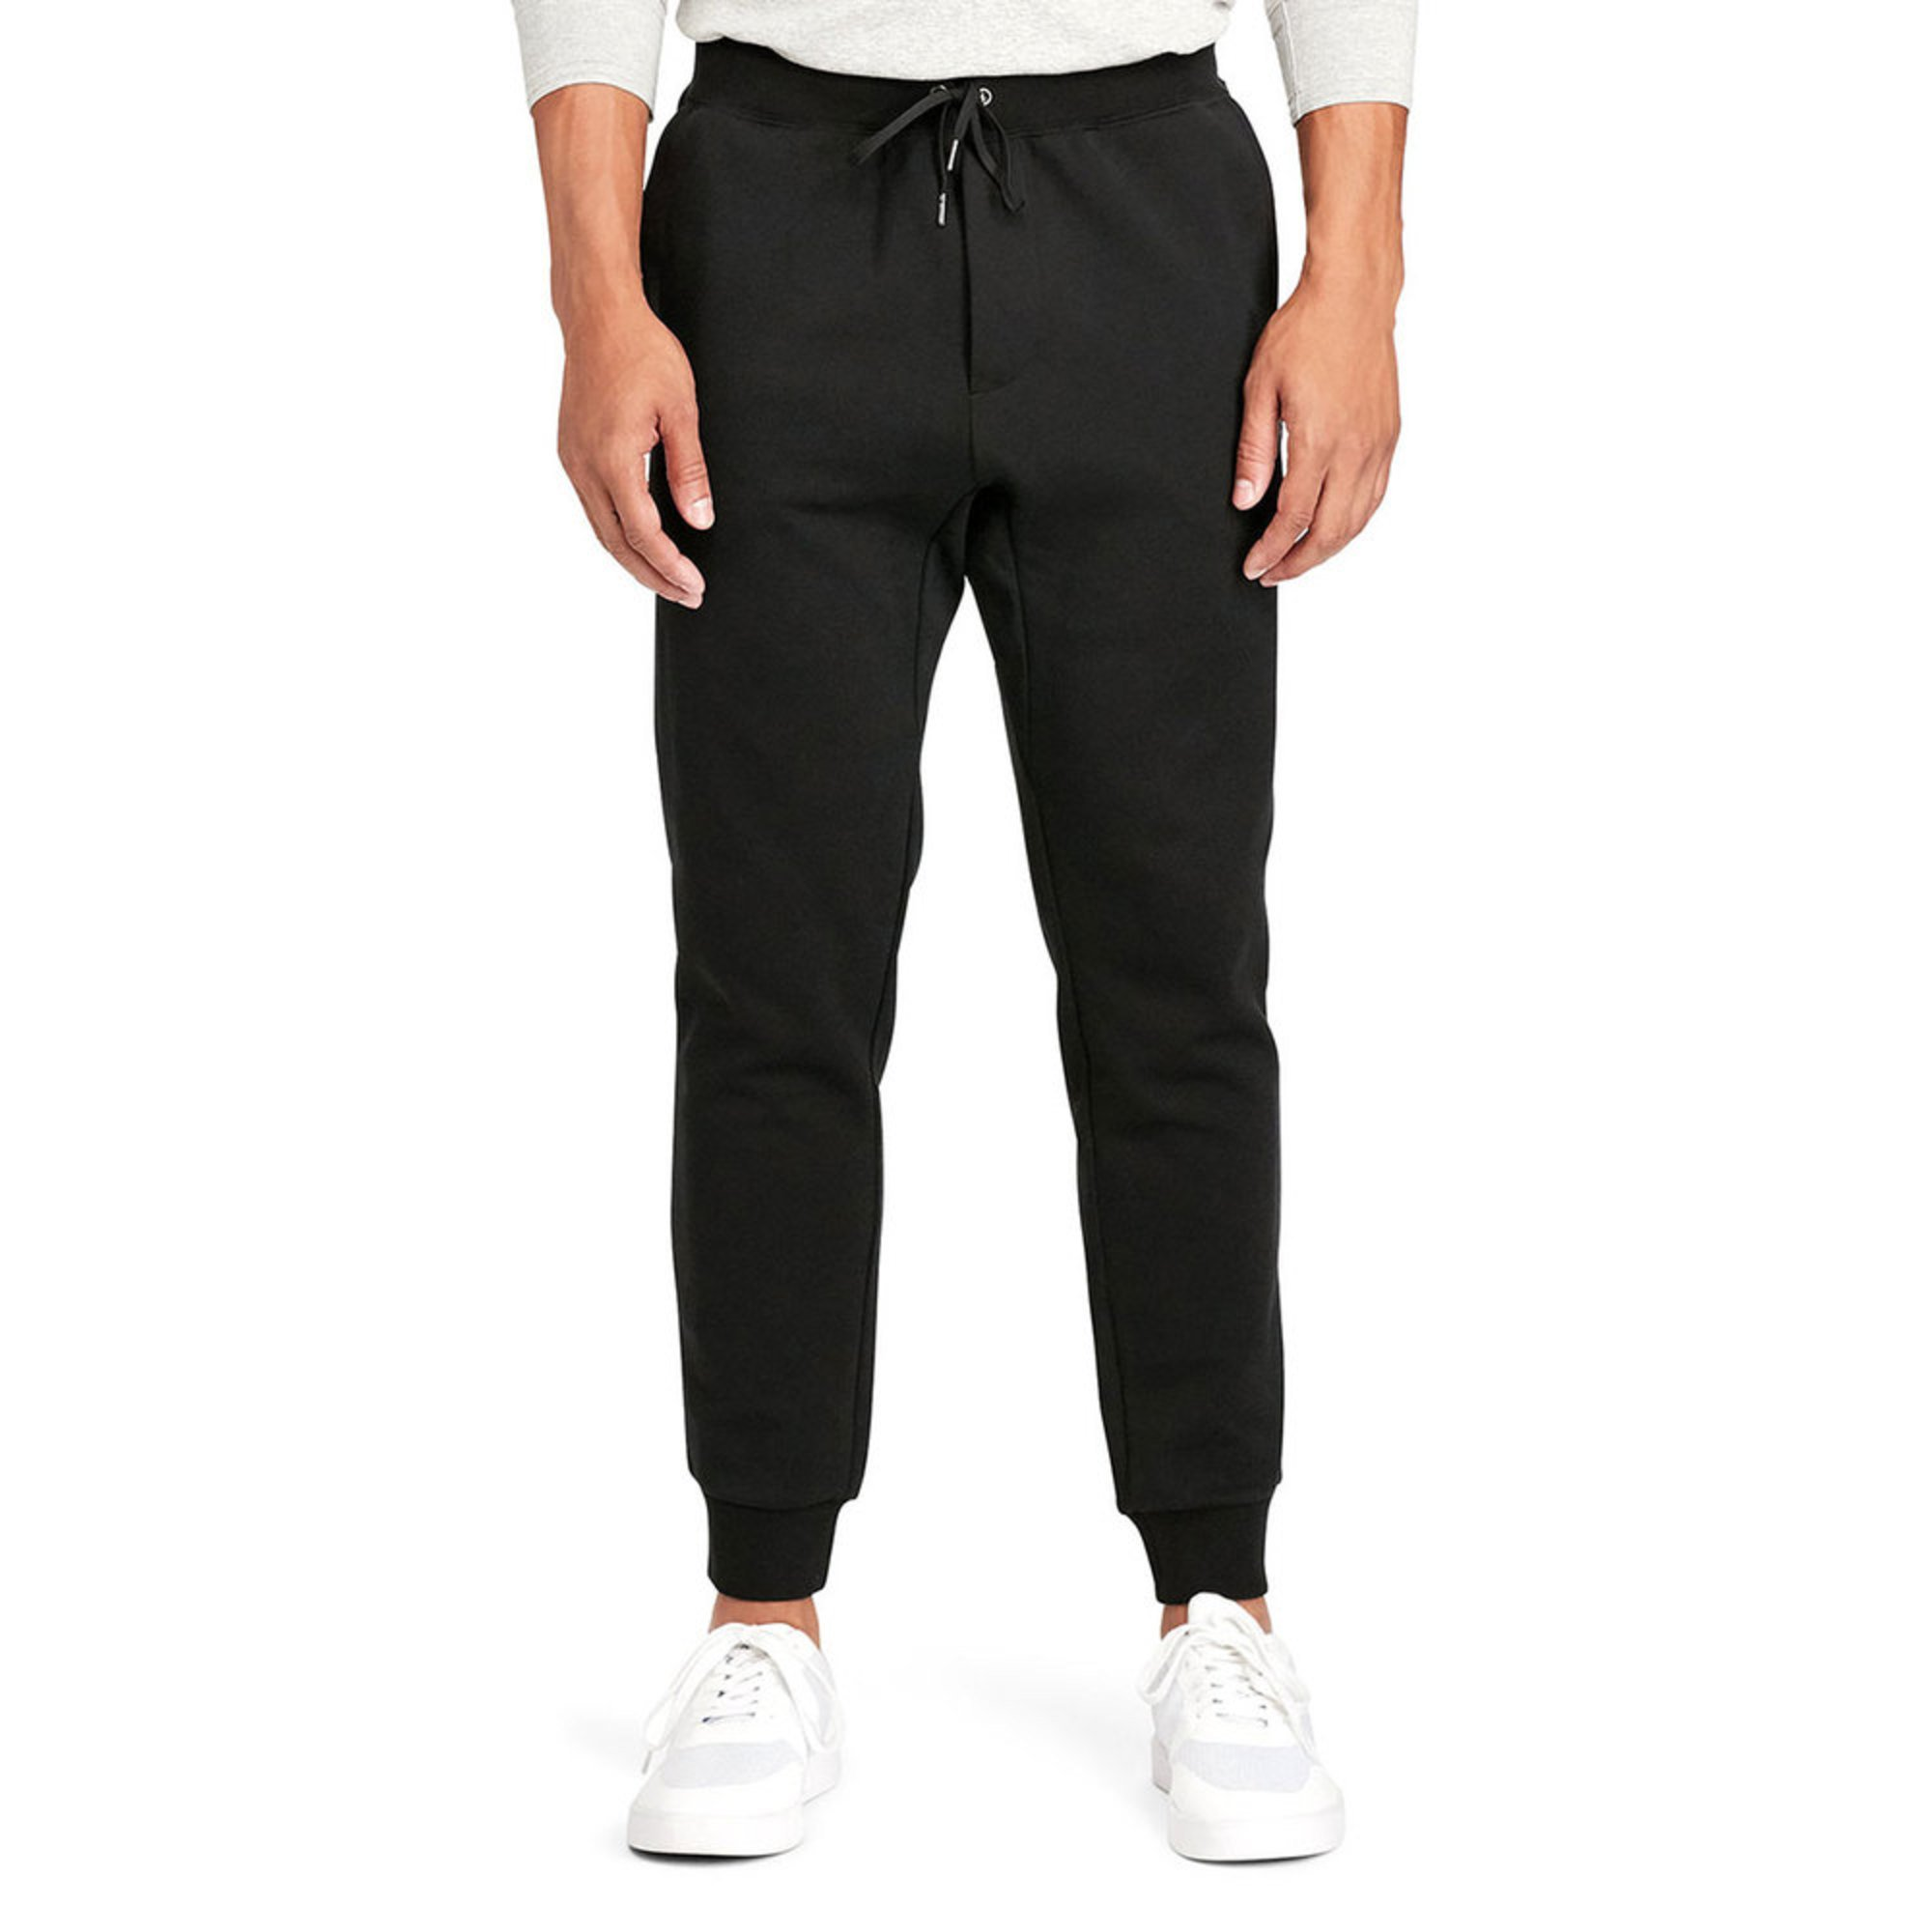 ac58c3d86 Polo Ralph Lauren. Polo Ralph Lauren Men s Jogger Pants